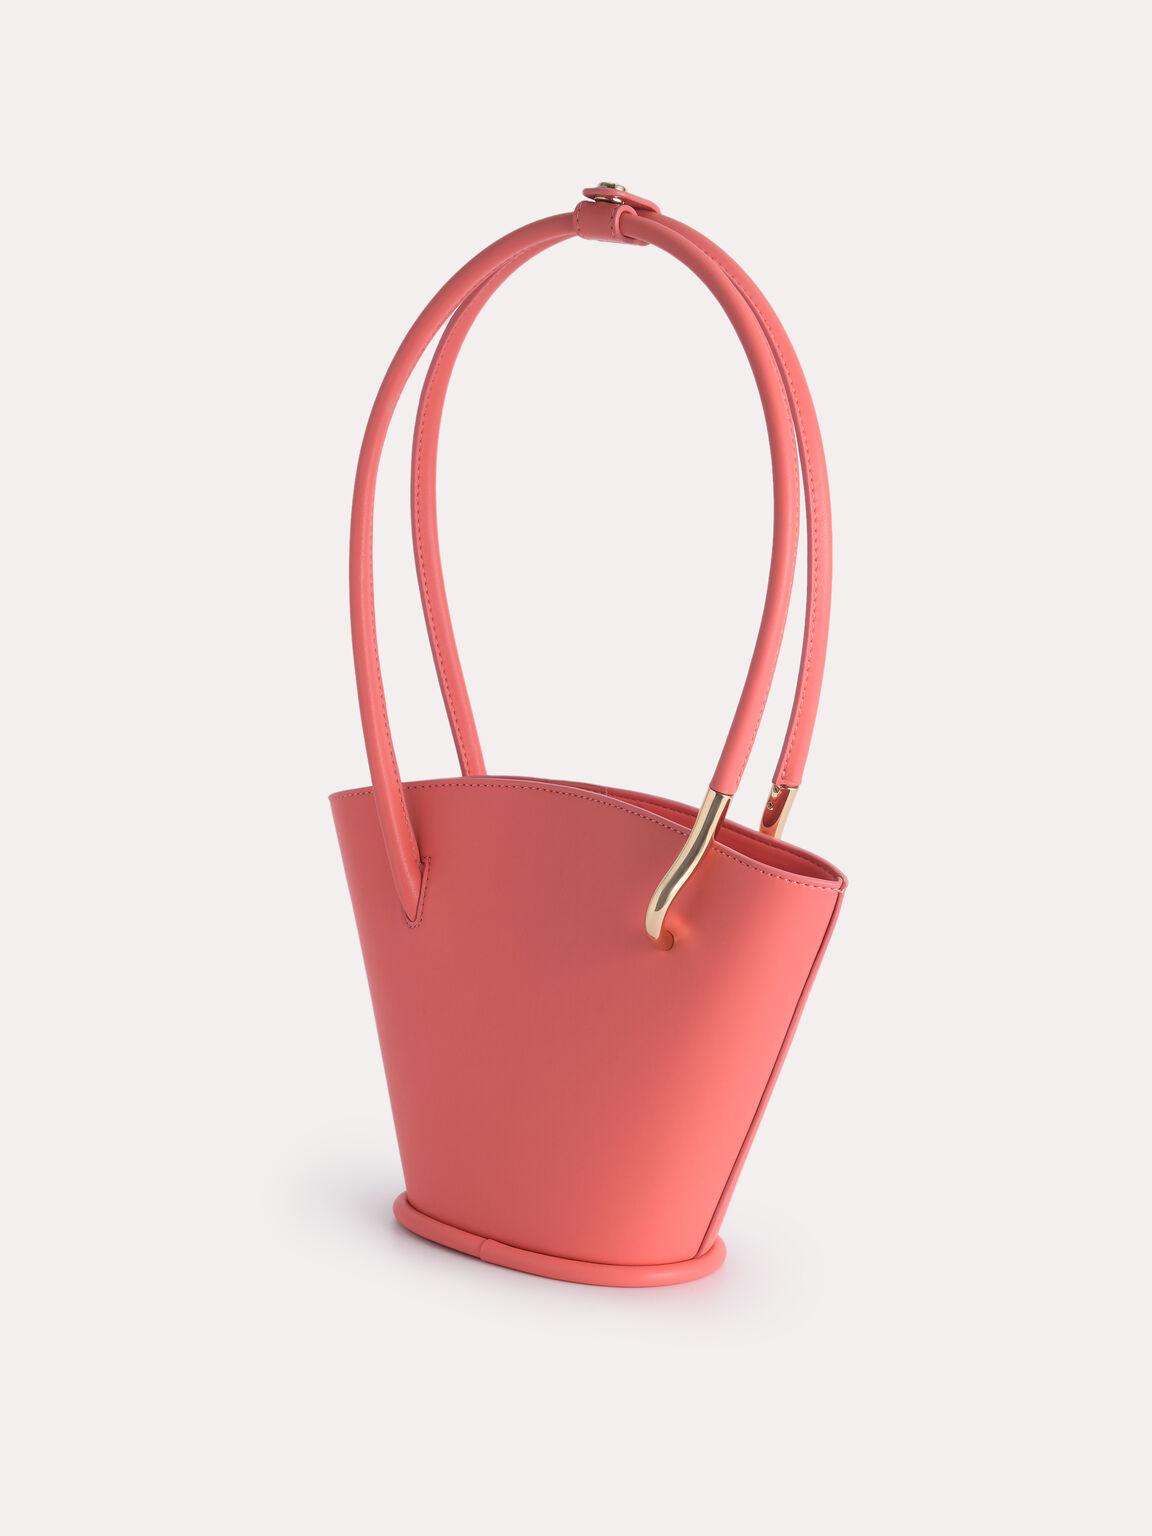 Pastel Bucket Tote Bag, Coral Pink, hi-res